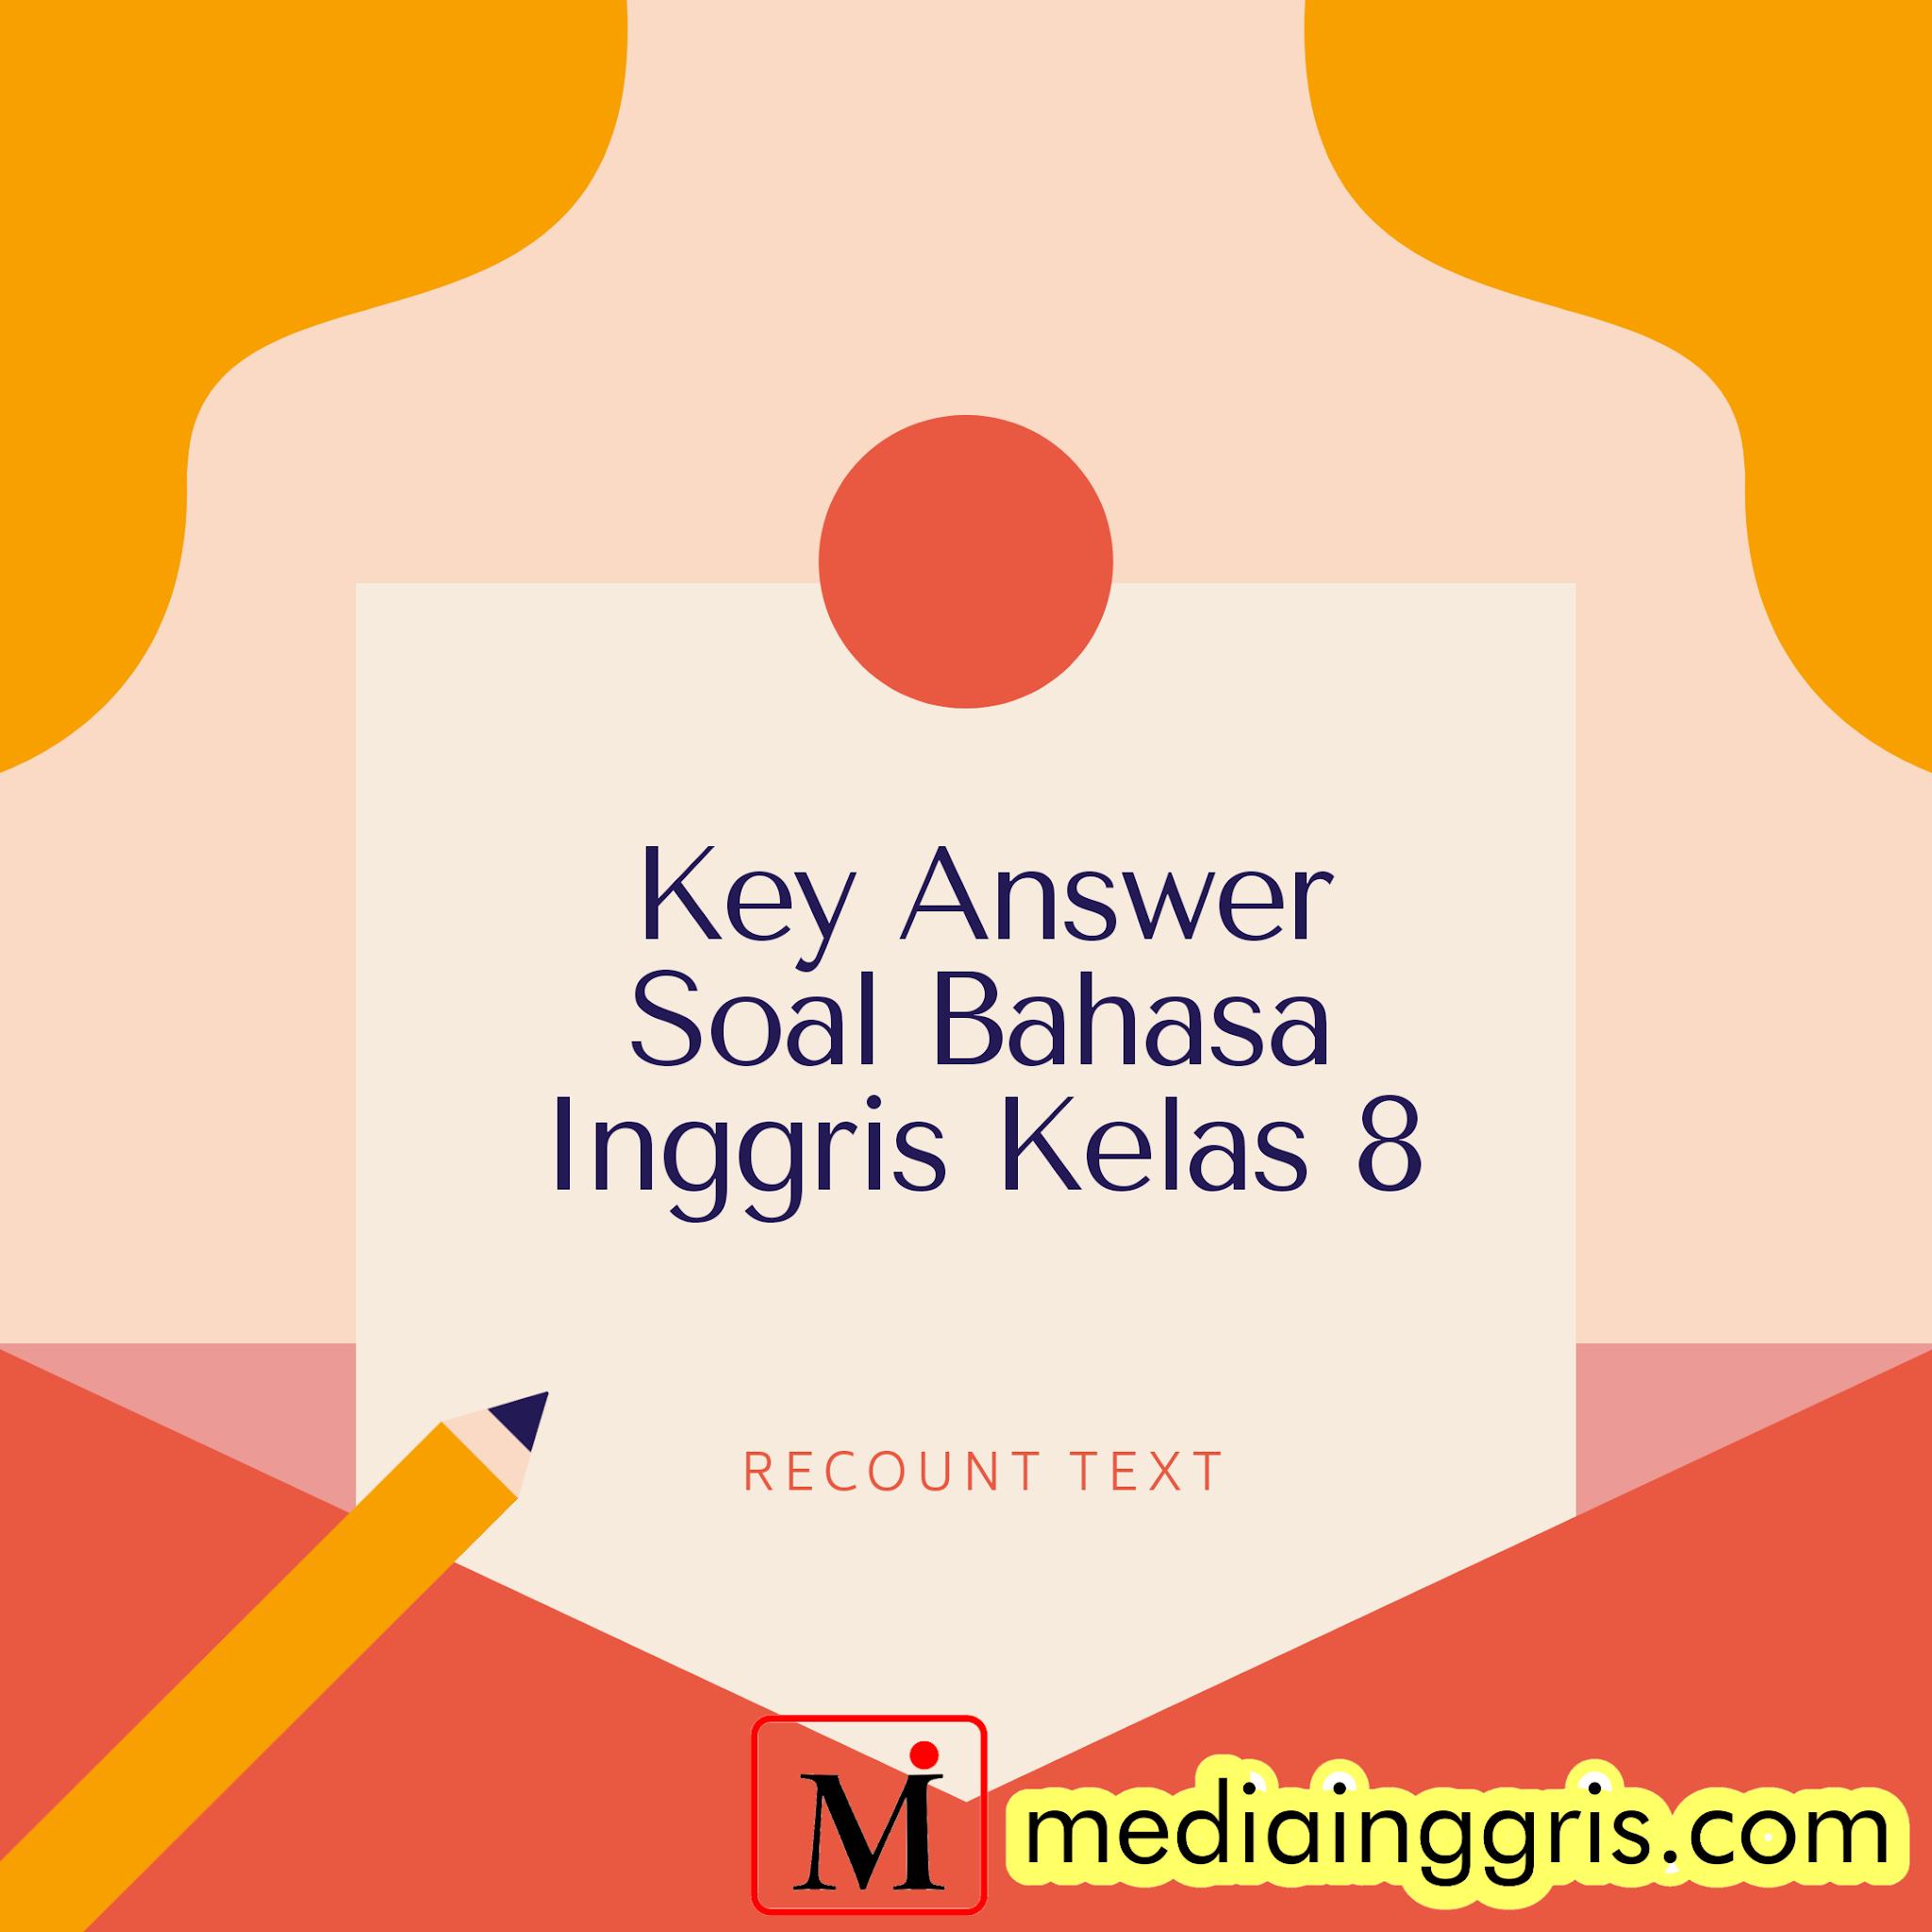 Recount Texts Kumpulan Contoh Soal Bahasa Inggris Smp Kelas 8 Materi Recount Texts Dengan Jawaban Mediainggris